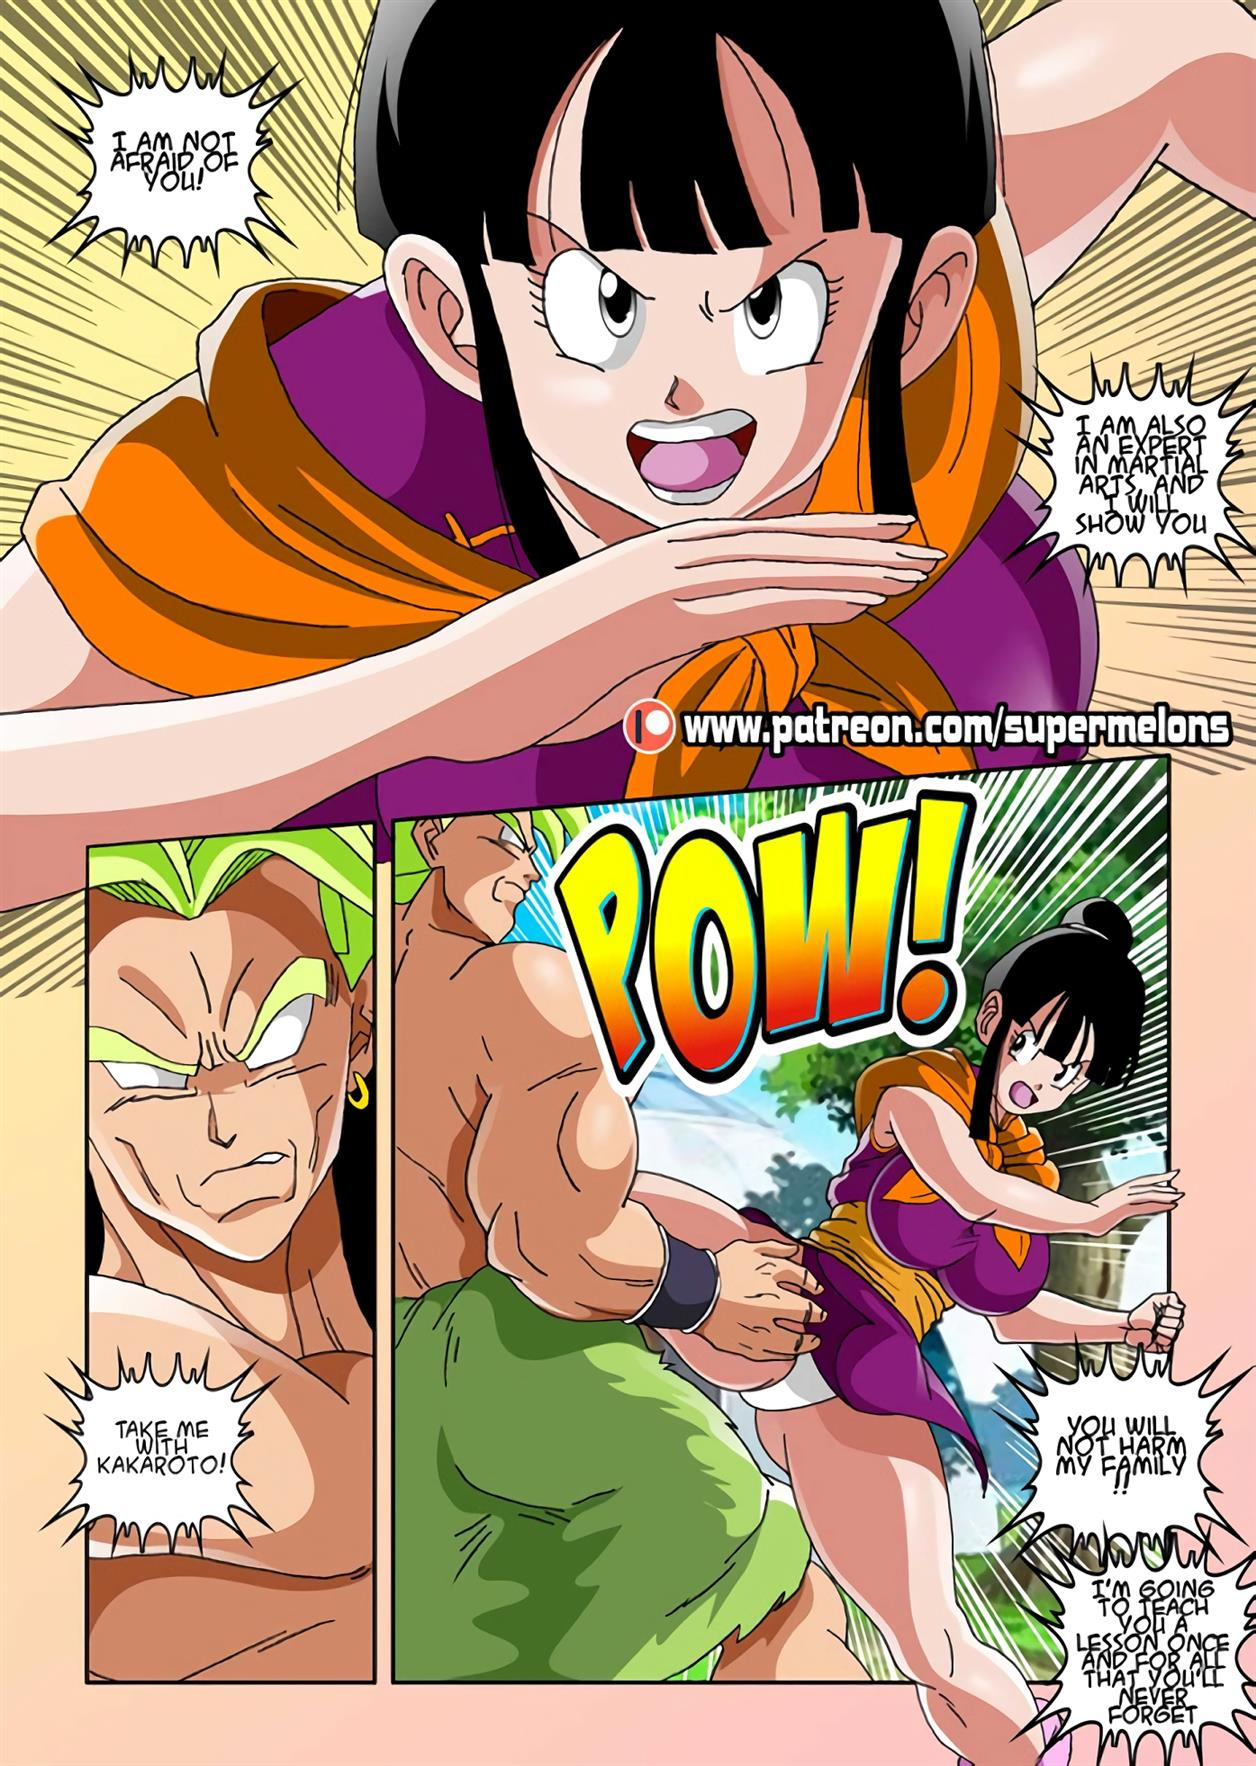 Carnal Debts Chi Chi (Dragon Ball Z) [Super Melons] - Foto 12